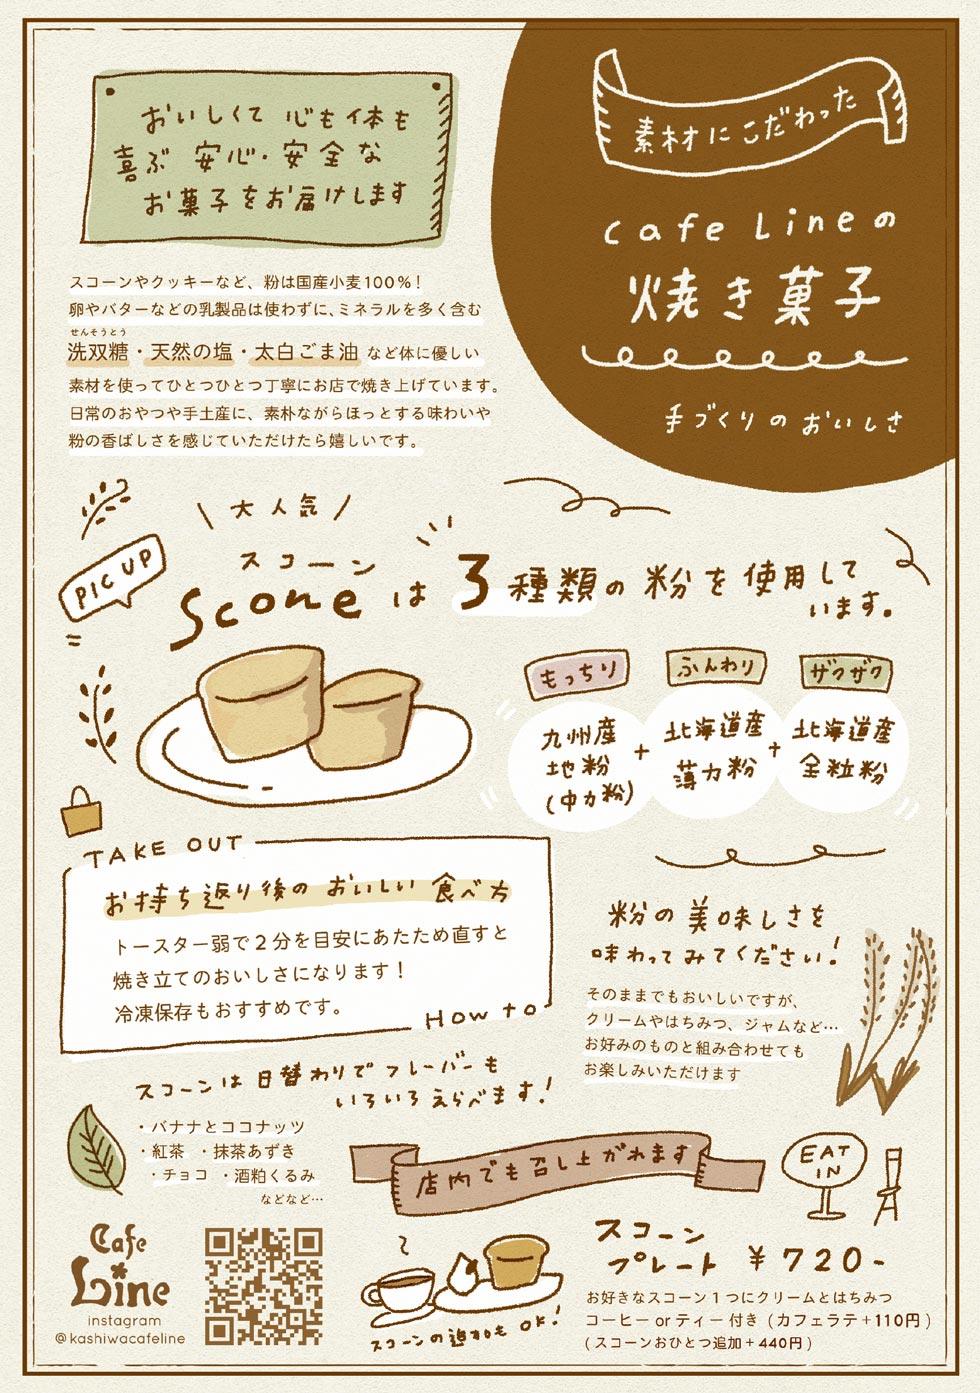 Cafe Lineの焼き菓子